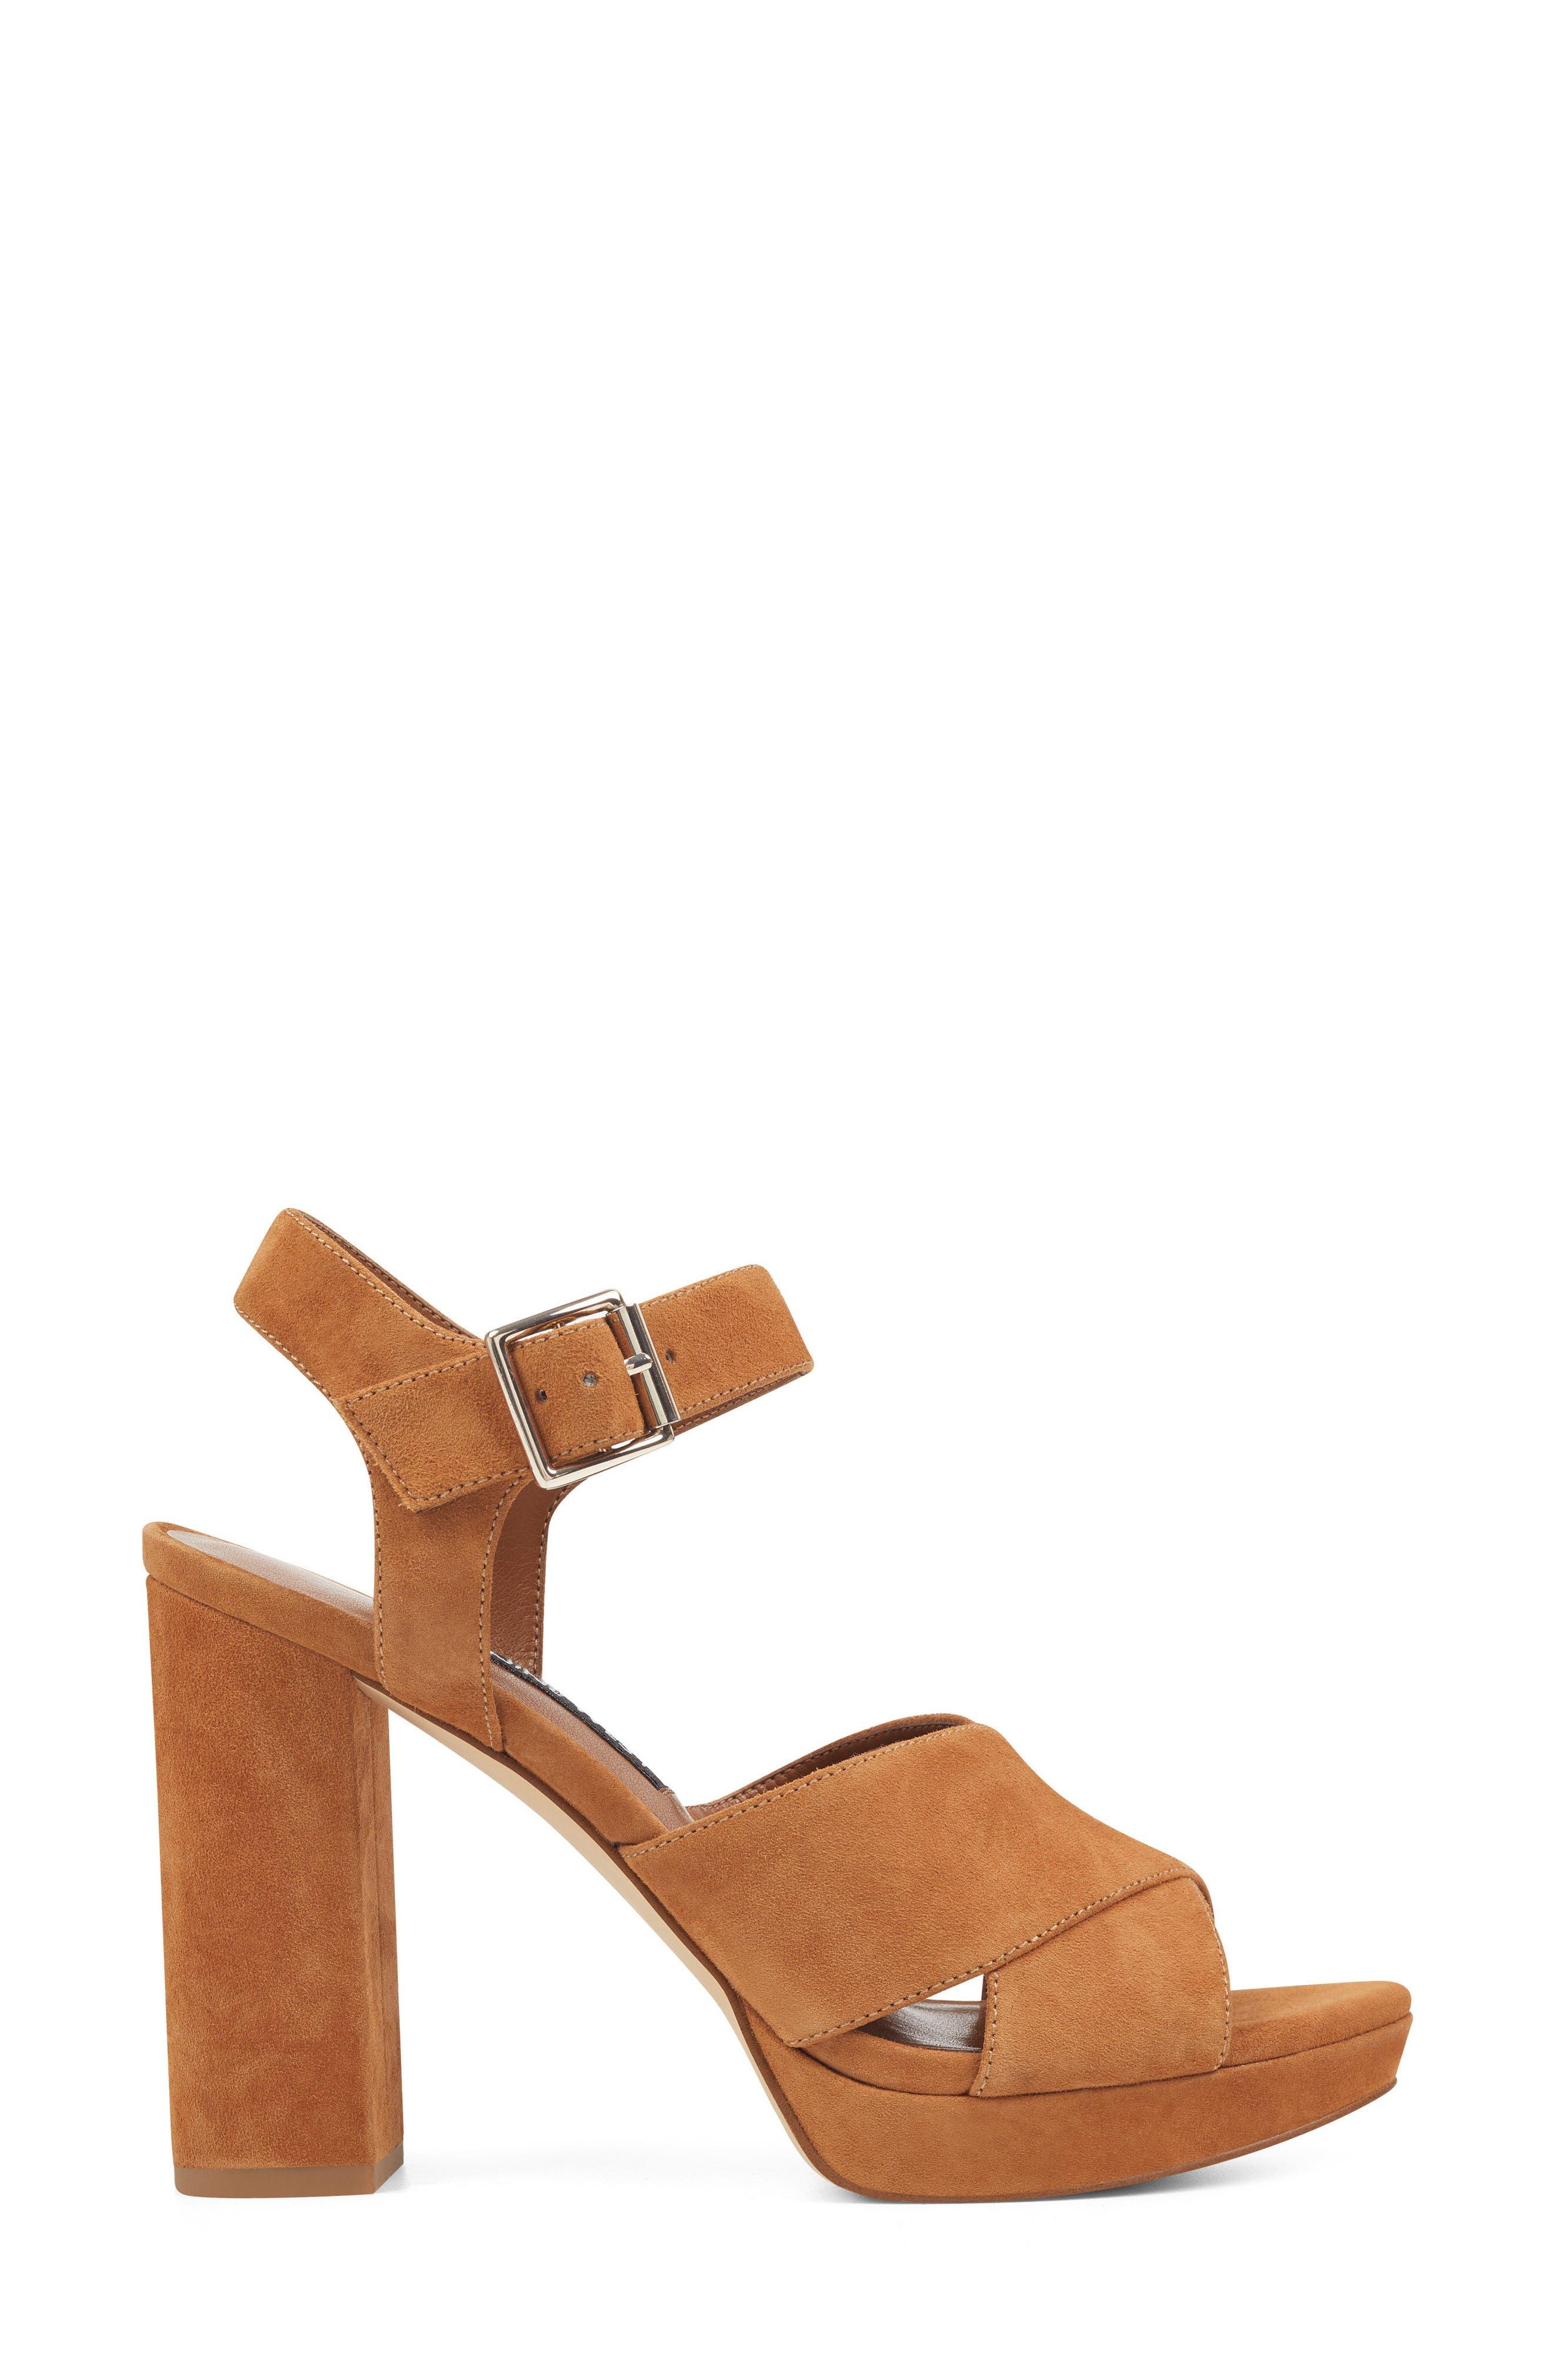 Jimar Platform Sandal,                             Alternate thumbnail 3, color,                             DARK NATURAL SUEDE